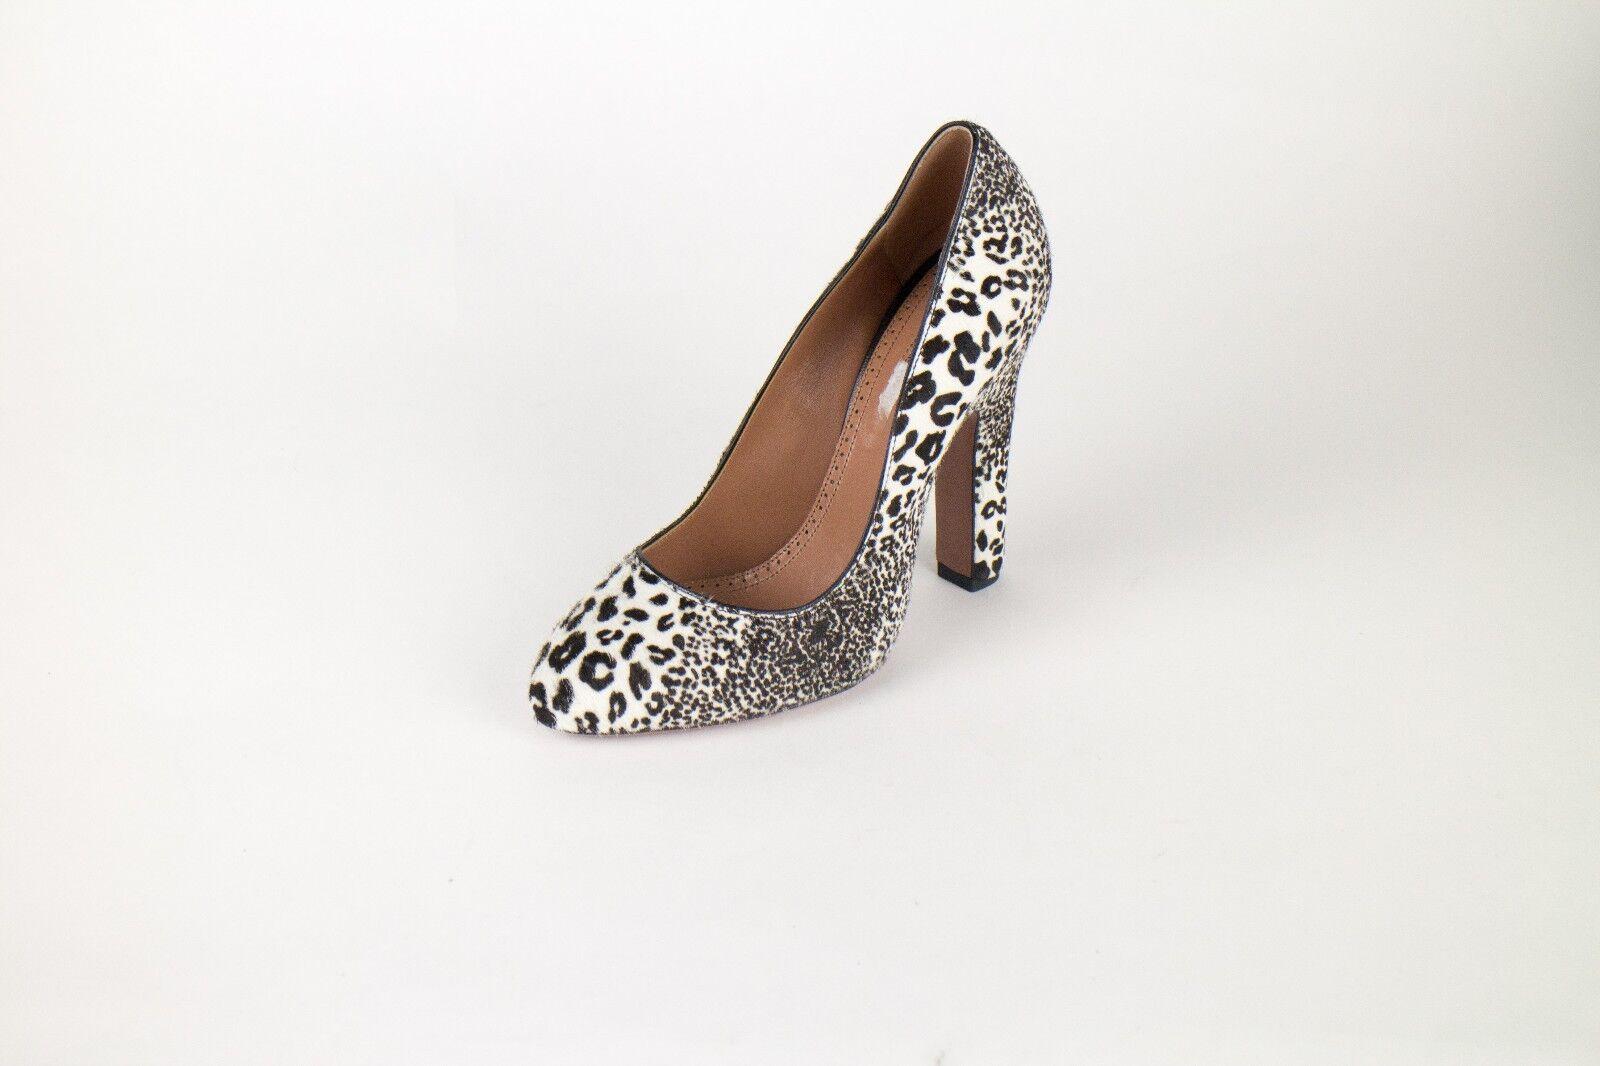 NIB Alaia Women's Ponyhair Leather Pumps 4.5    Heels shoes Size 6 36  1535 5a19ac